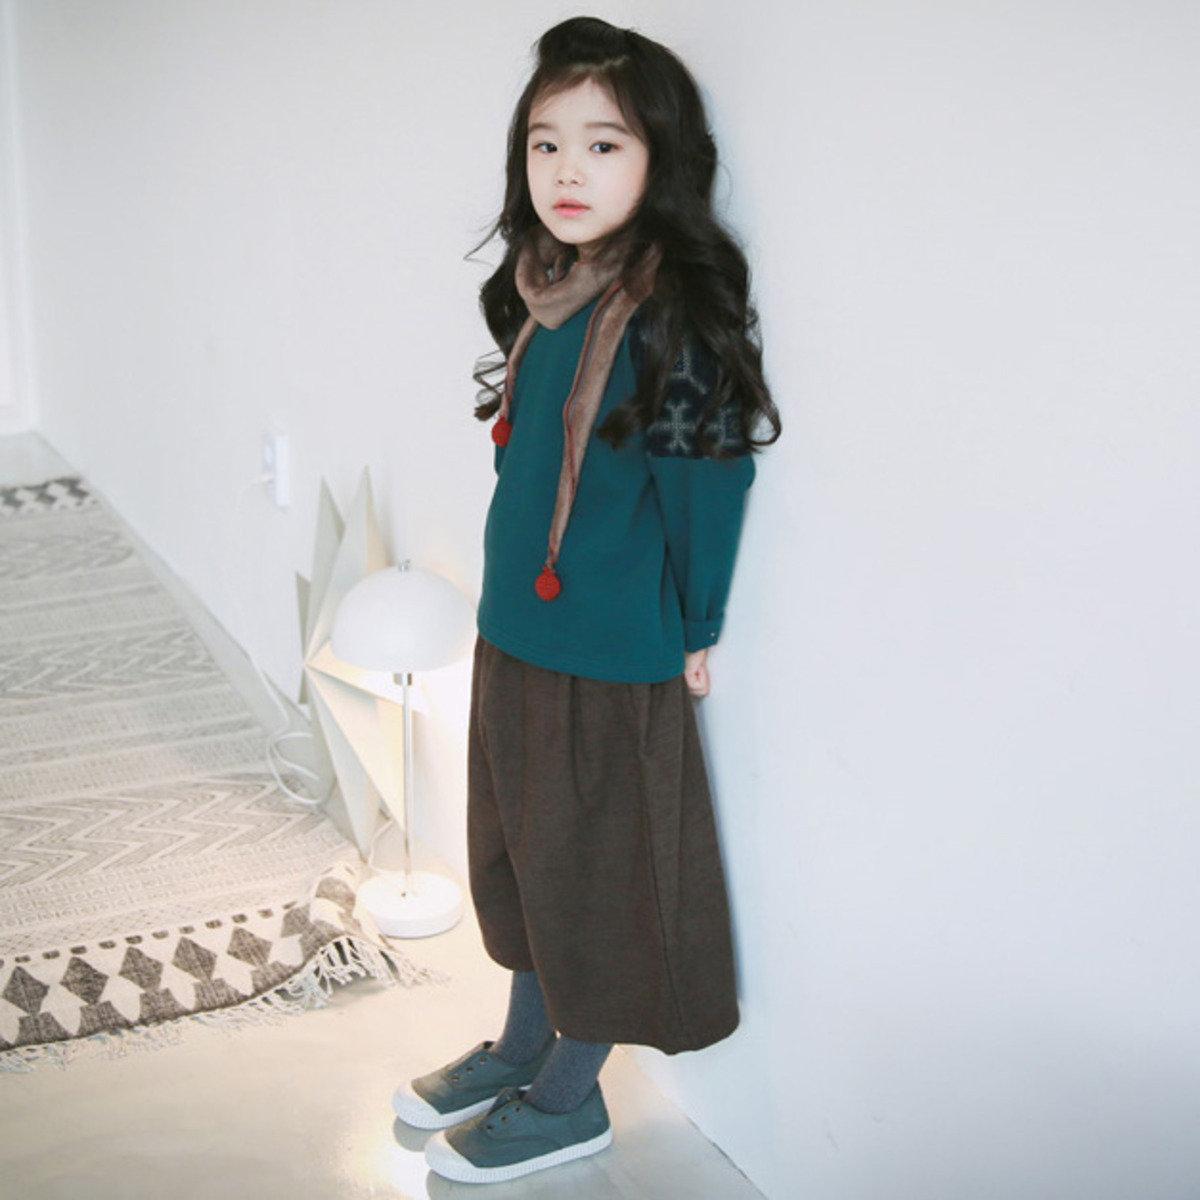 [15 W] 闊帶款連身裙褲_S62586